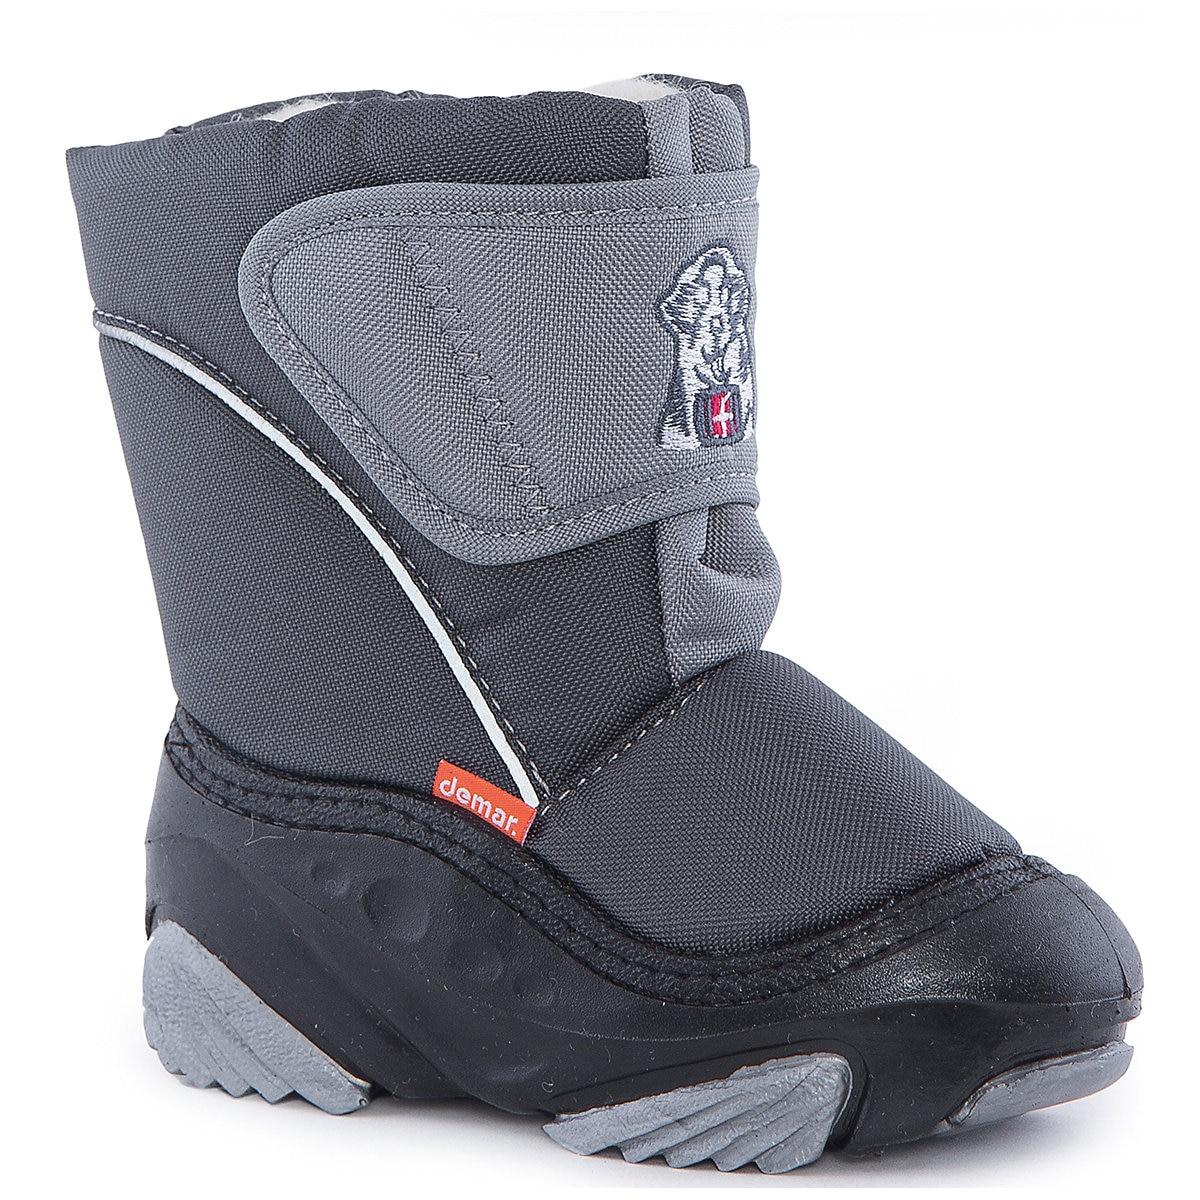 Botas Demar para niñas 6835183 Valenki Uggi invierno Bebé niños zapatos MTpromo